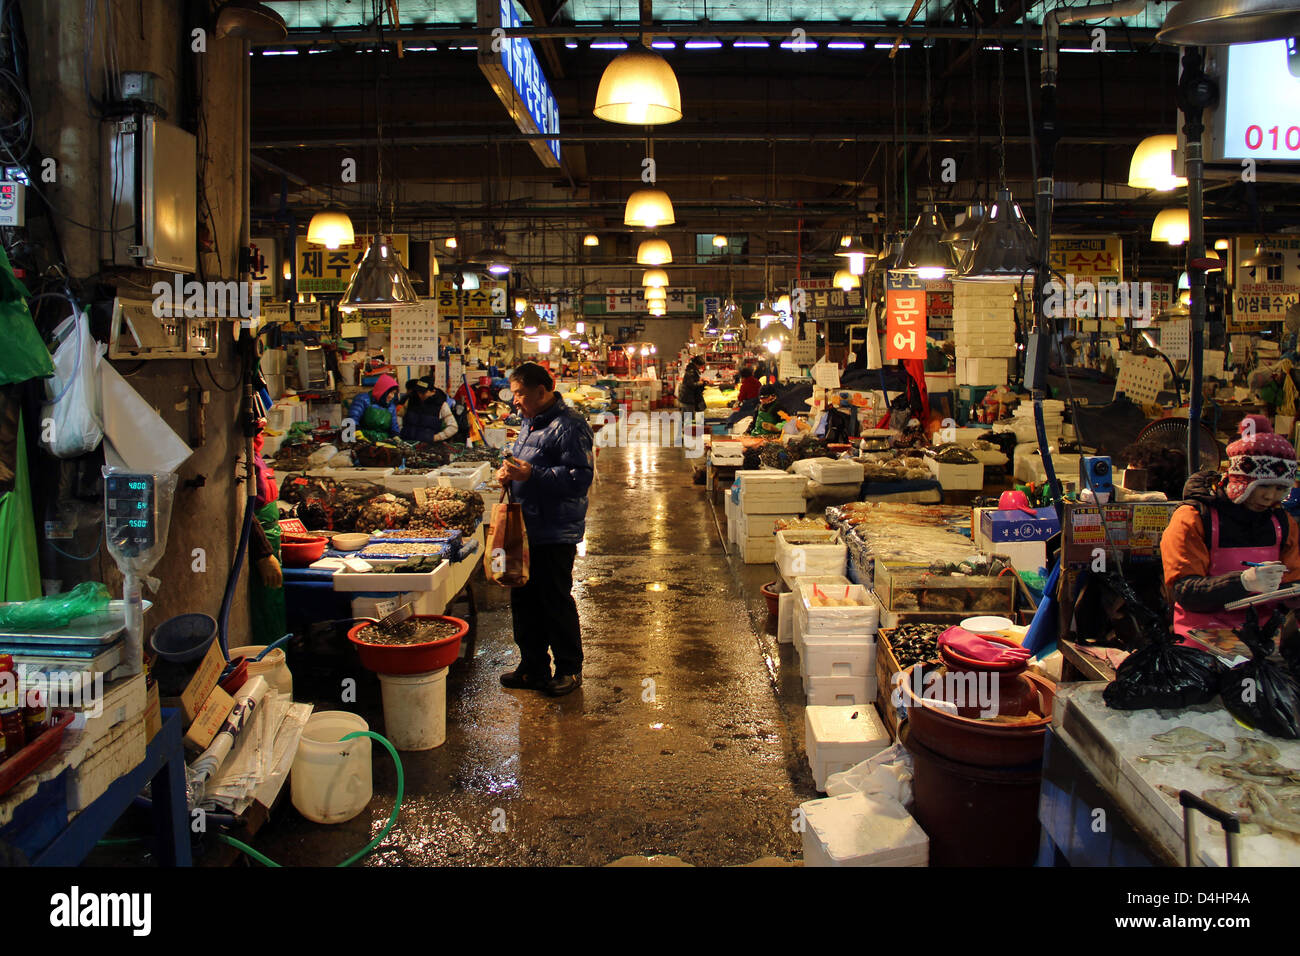 Corea del Sur: Mercado Mayorista Pesquero Noryangjin, Seúl Foto de stock